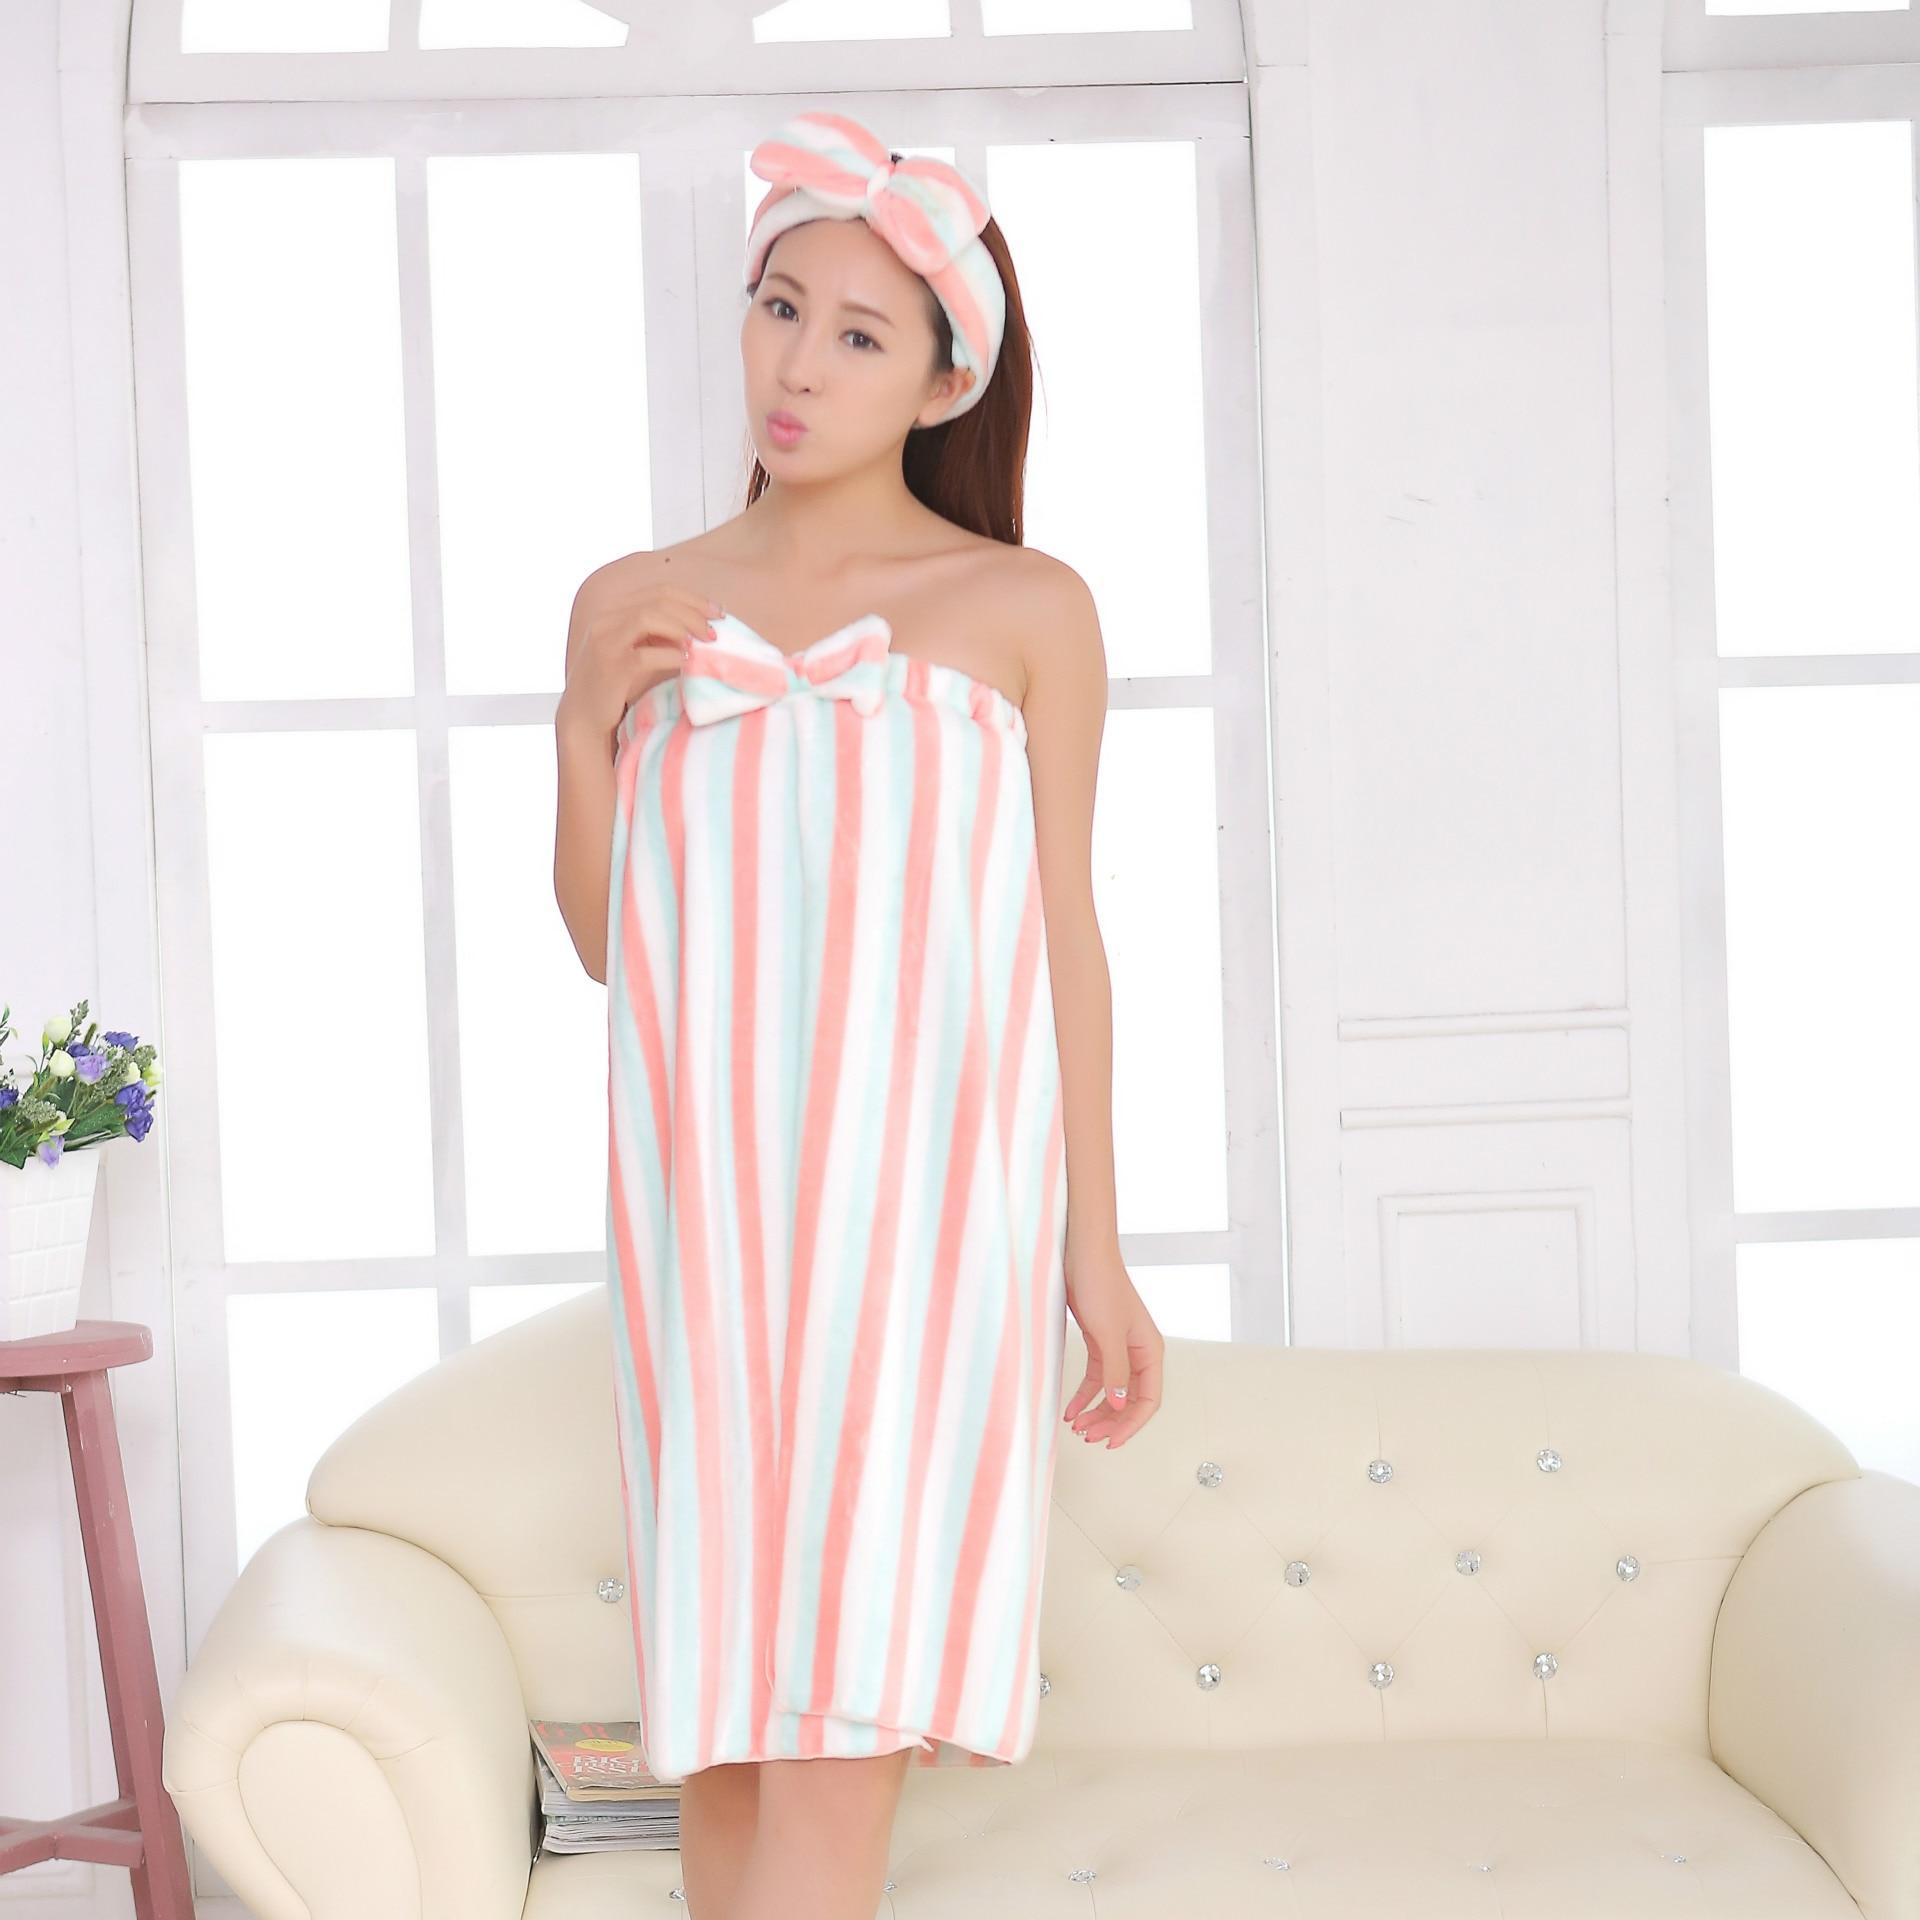 120*75cm Women Sexy Wearable Absorbent Bath Towel+Hair Cap Bathroom Towel Set Bow-knot Body Wrap Bathrobe Spa Skirt for Adults